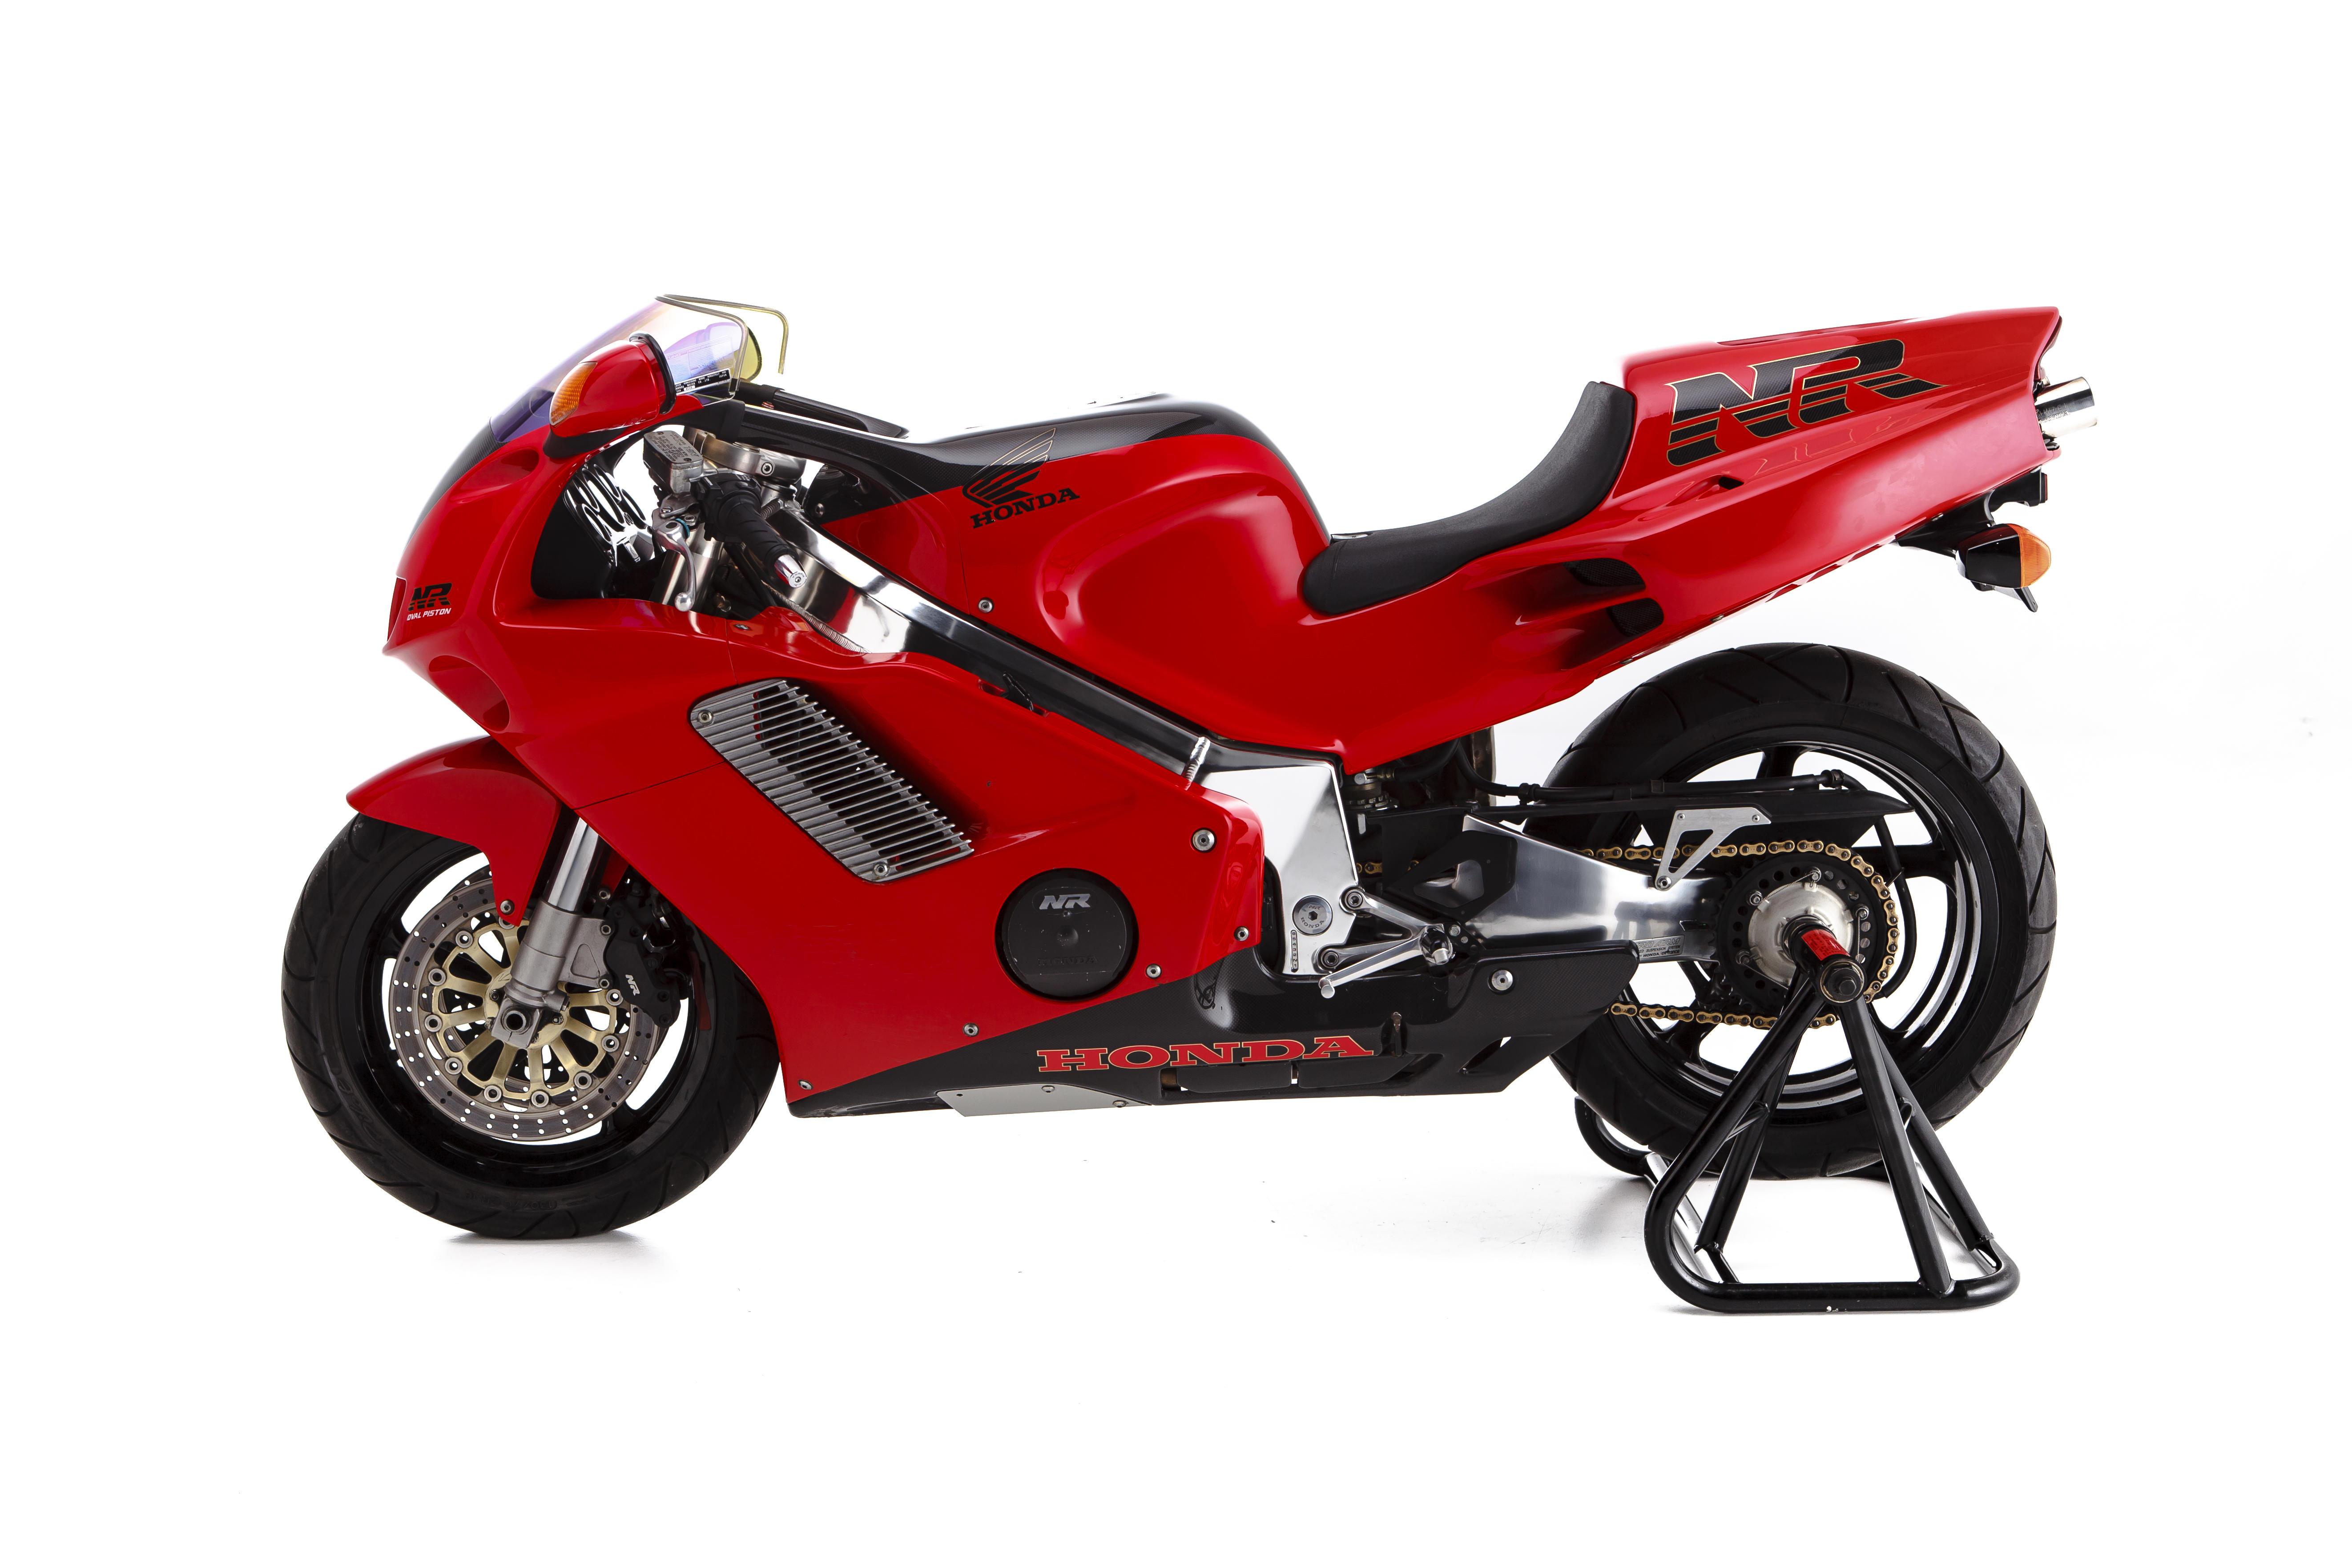 Honda NR750 sells for £57,500